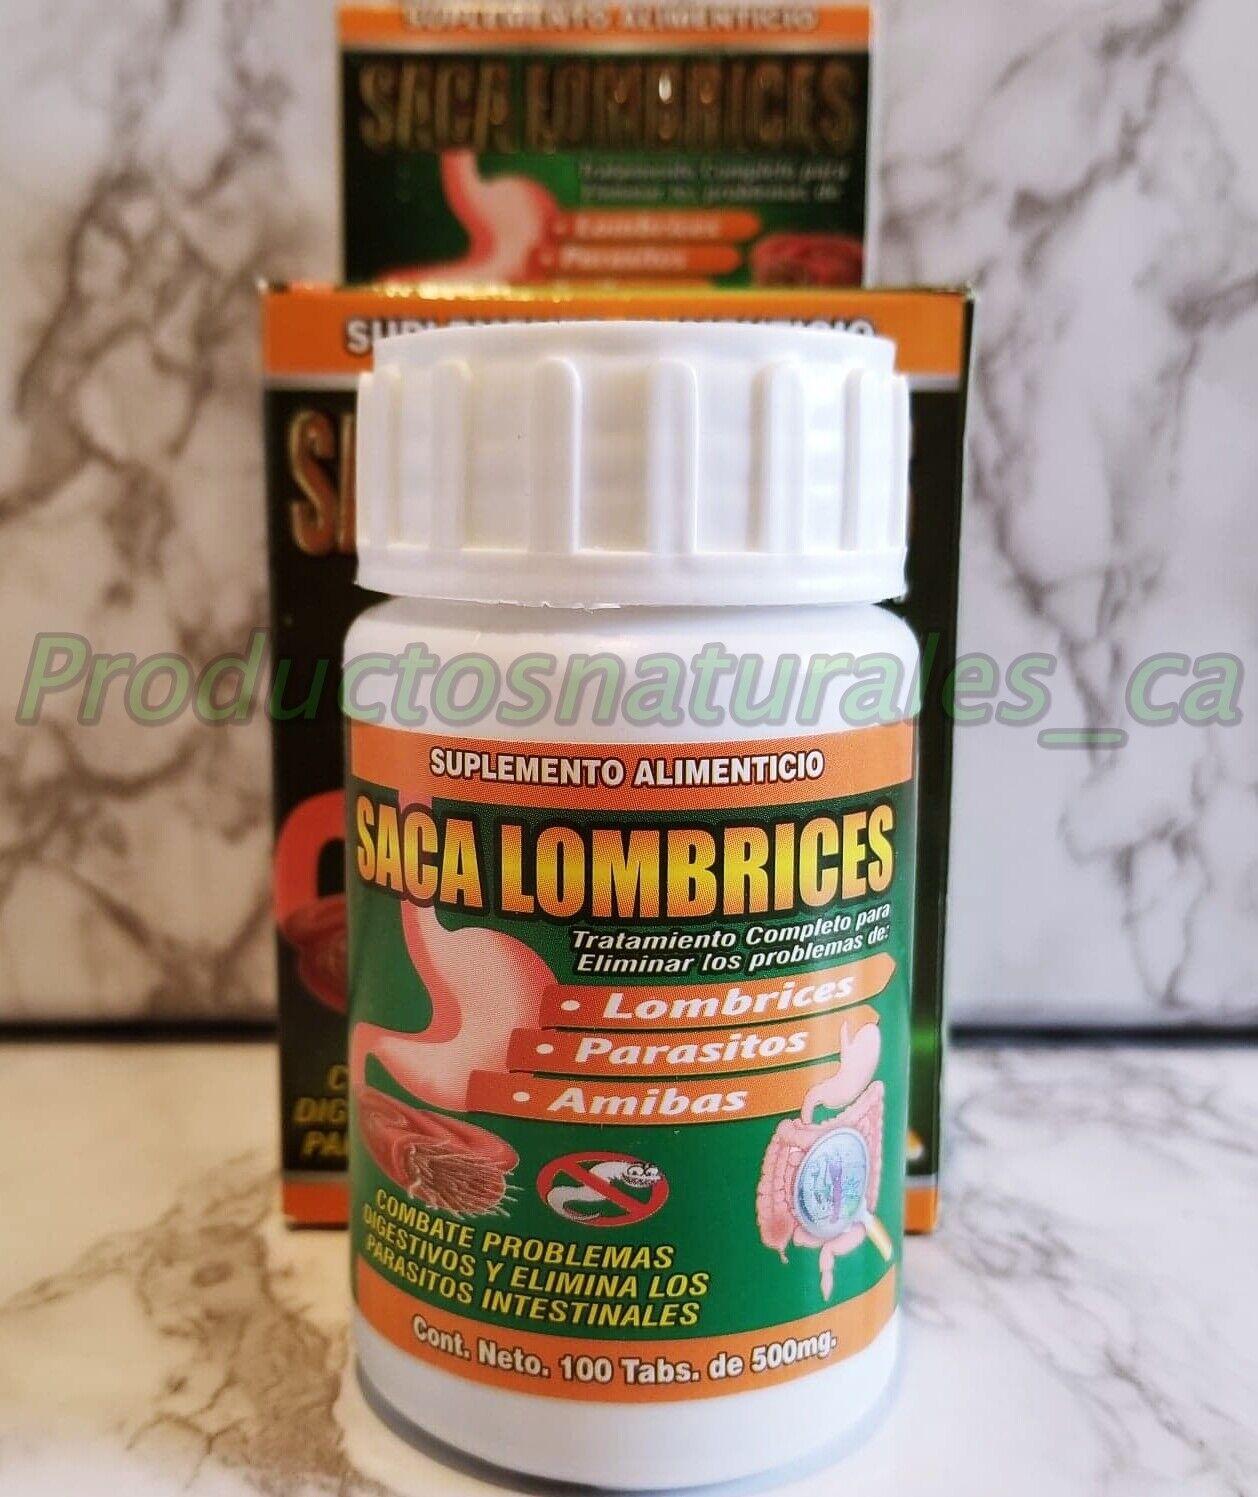 Saca Lombrices(Desparasitante tratamiento para Lombrices,Parasitos&Amibas)100Tab 2